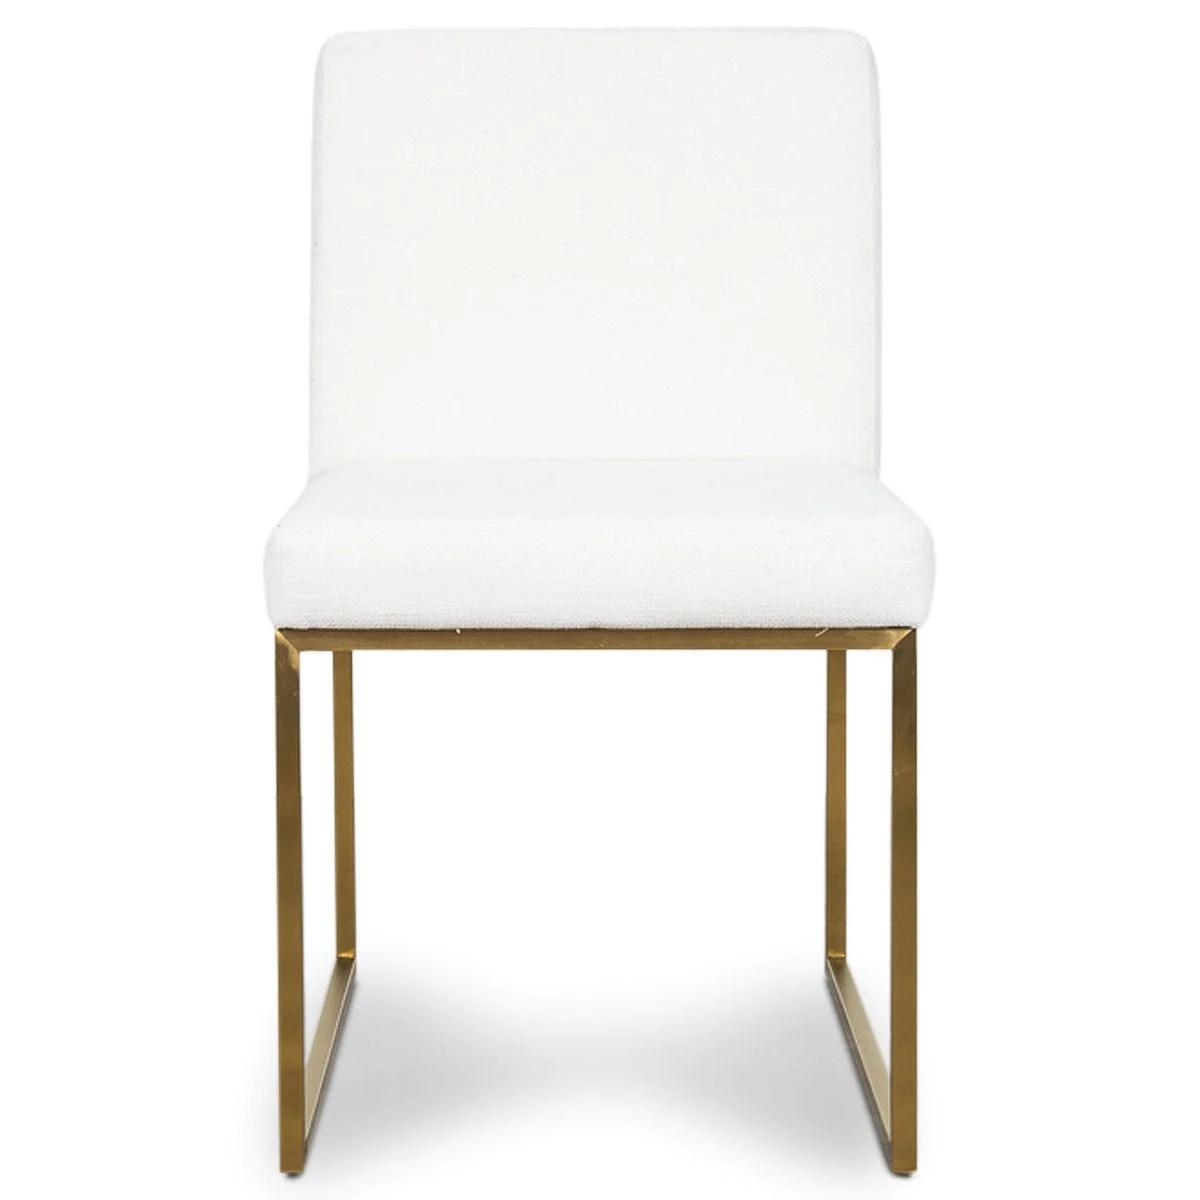 white linen chair cloud bean bag 007 goldfinger dining modshop